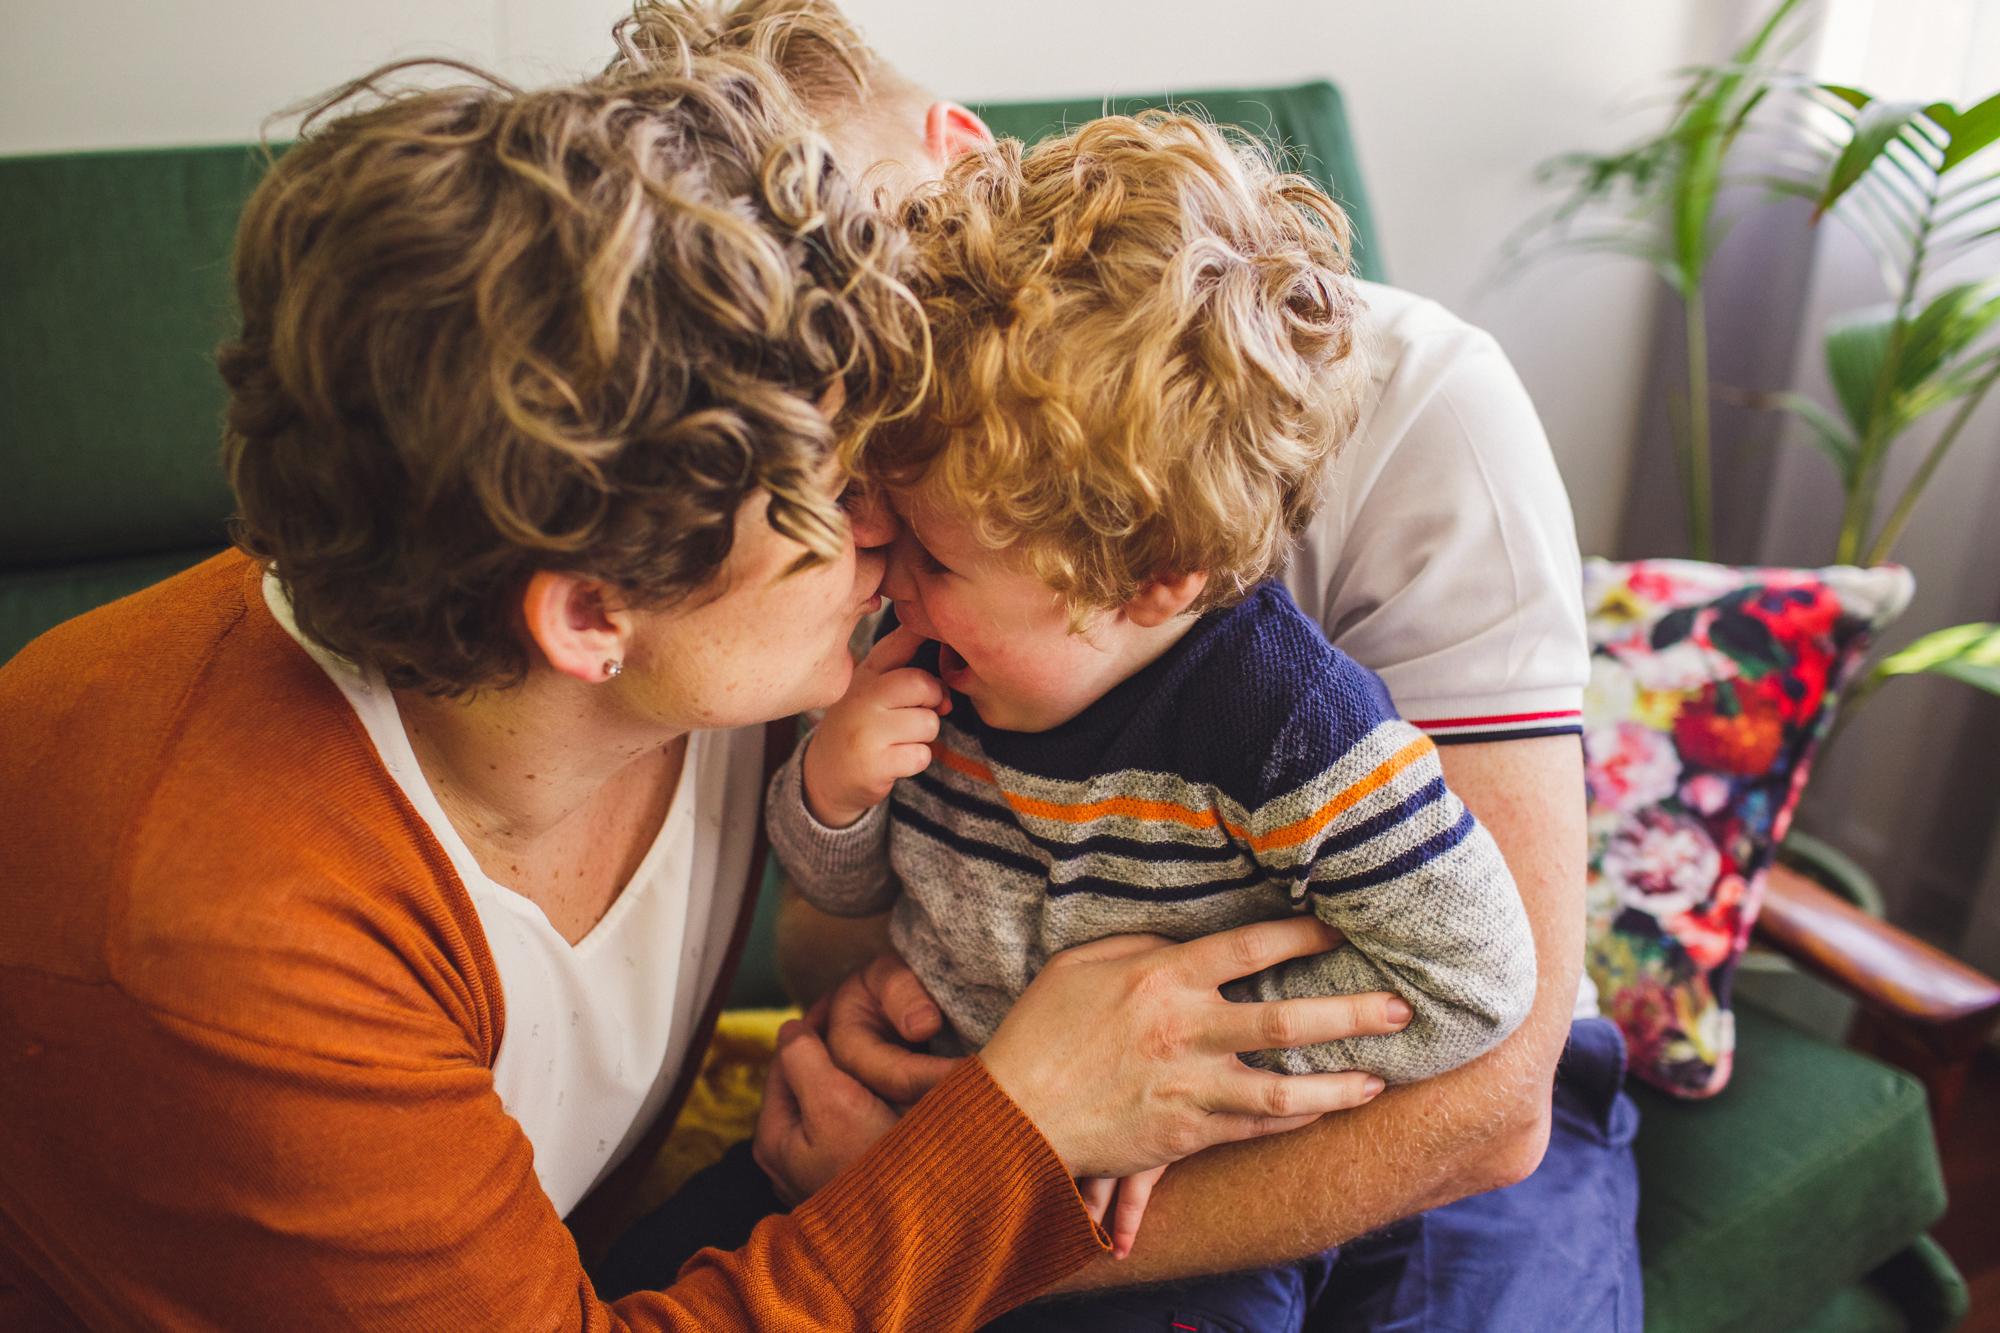 Documentary-family-photography-014.JPG